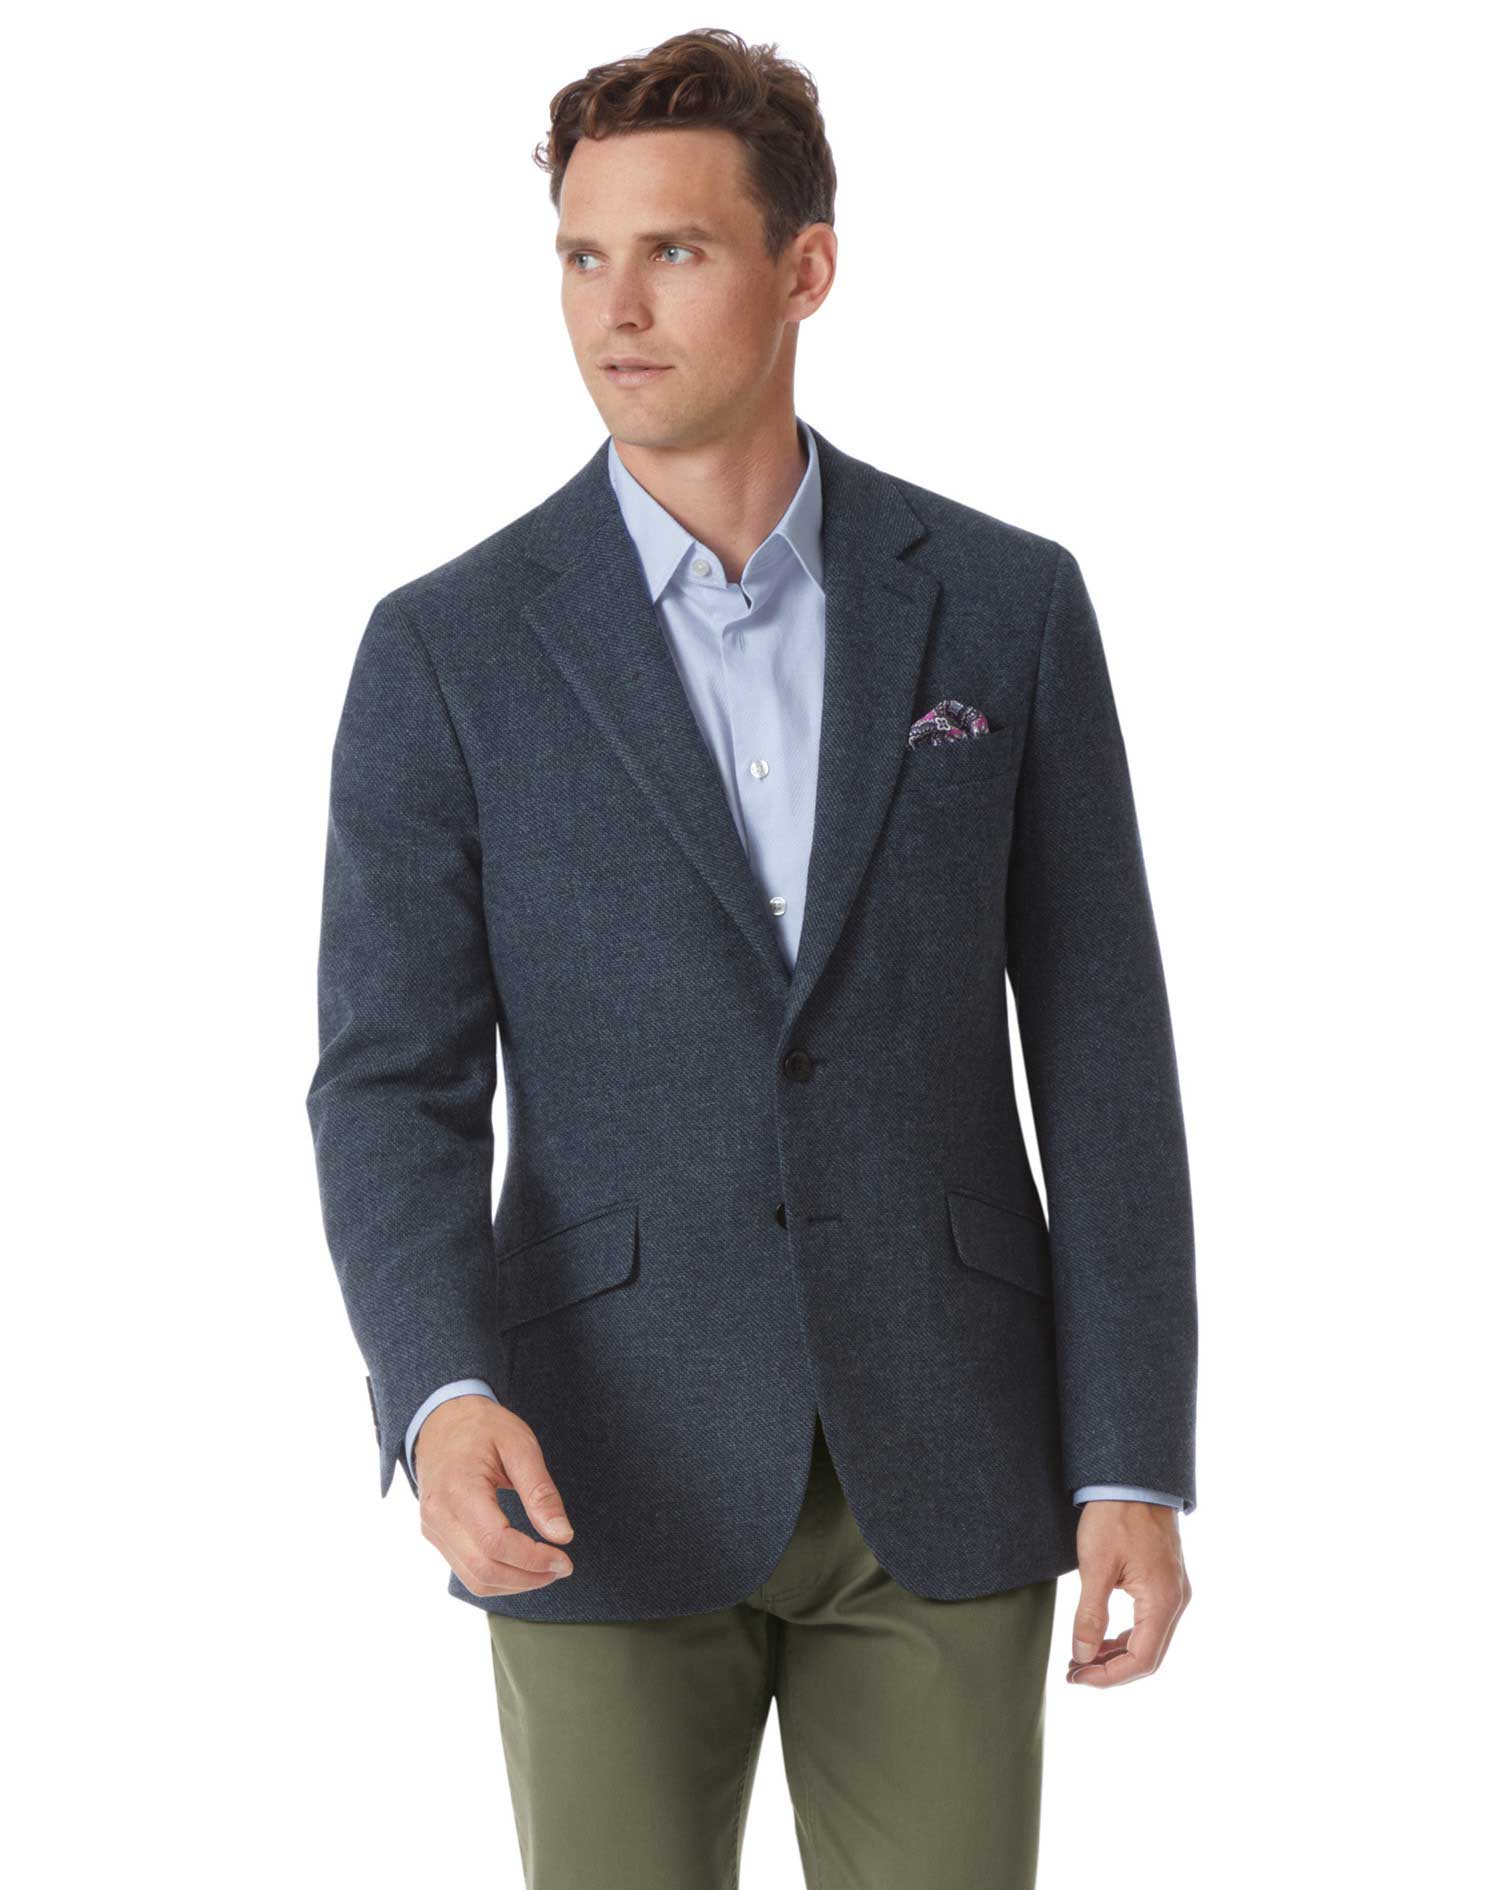 Slim Fit Indigo Blue Wool Jacket Size 42 Regular by Charles Tyrwhitt